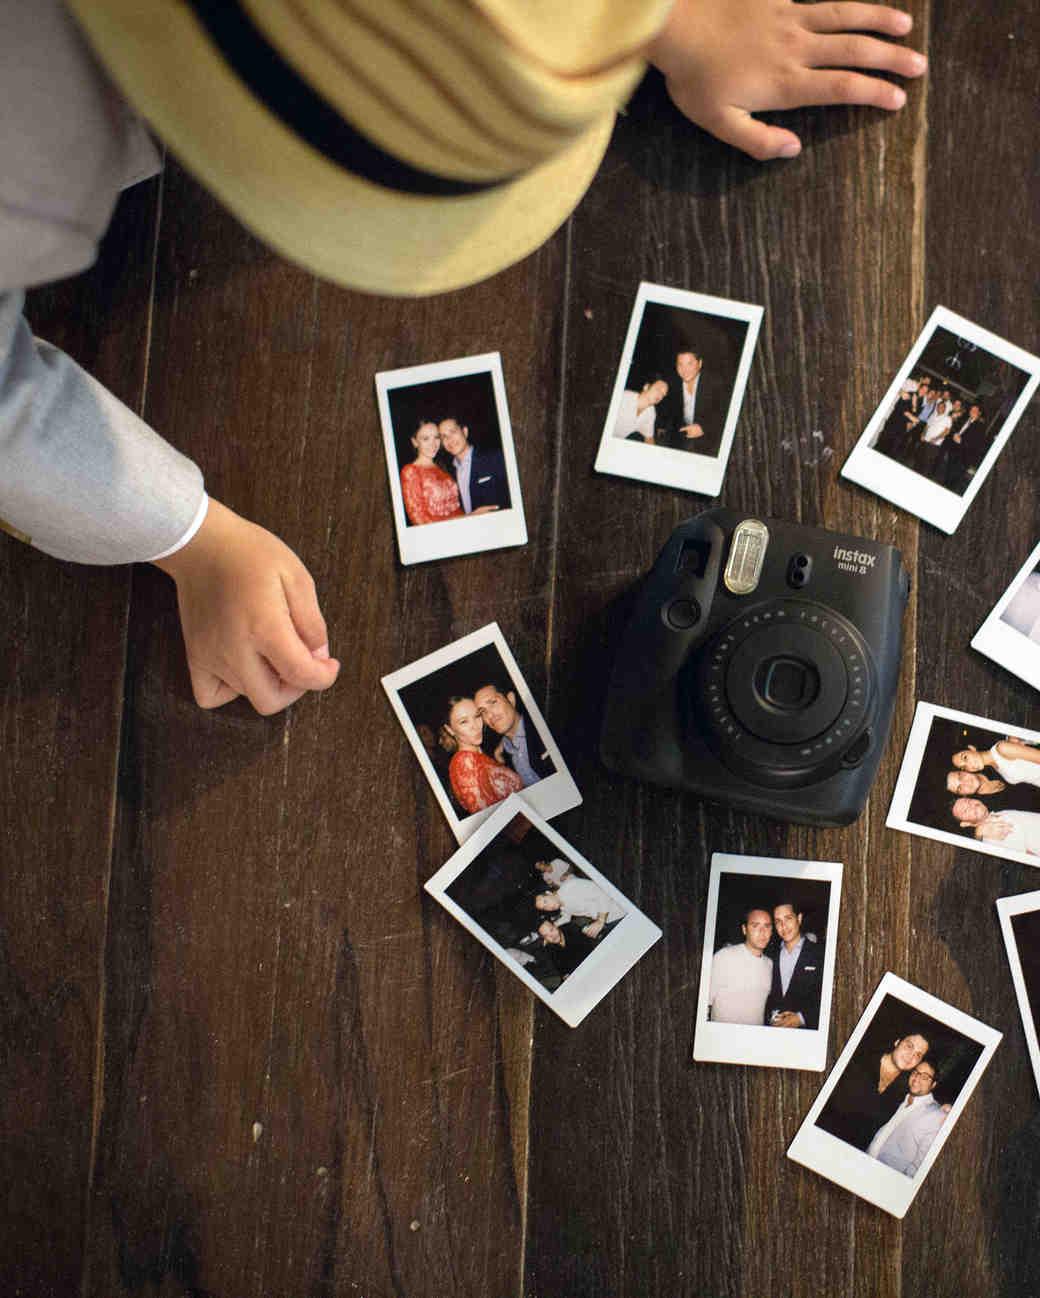 olivia-keith-wedding-polaroids-38-s112304-0815.jpg